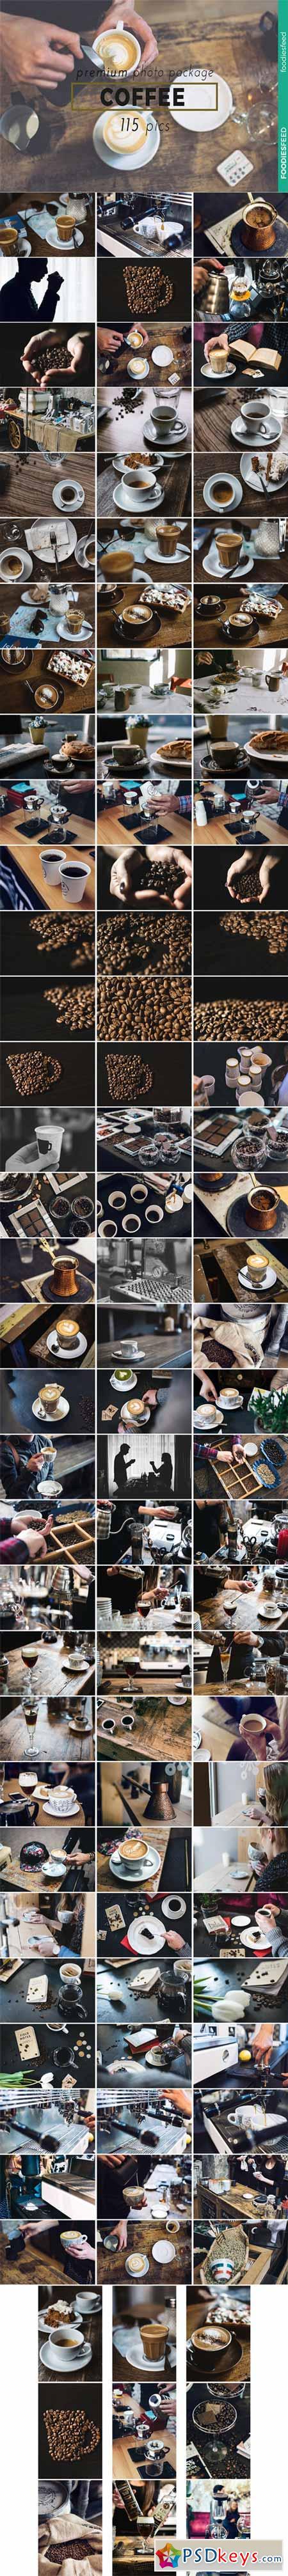 COFFEE - 115 Premium Photos 461744